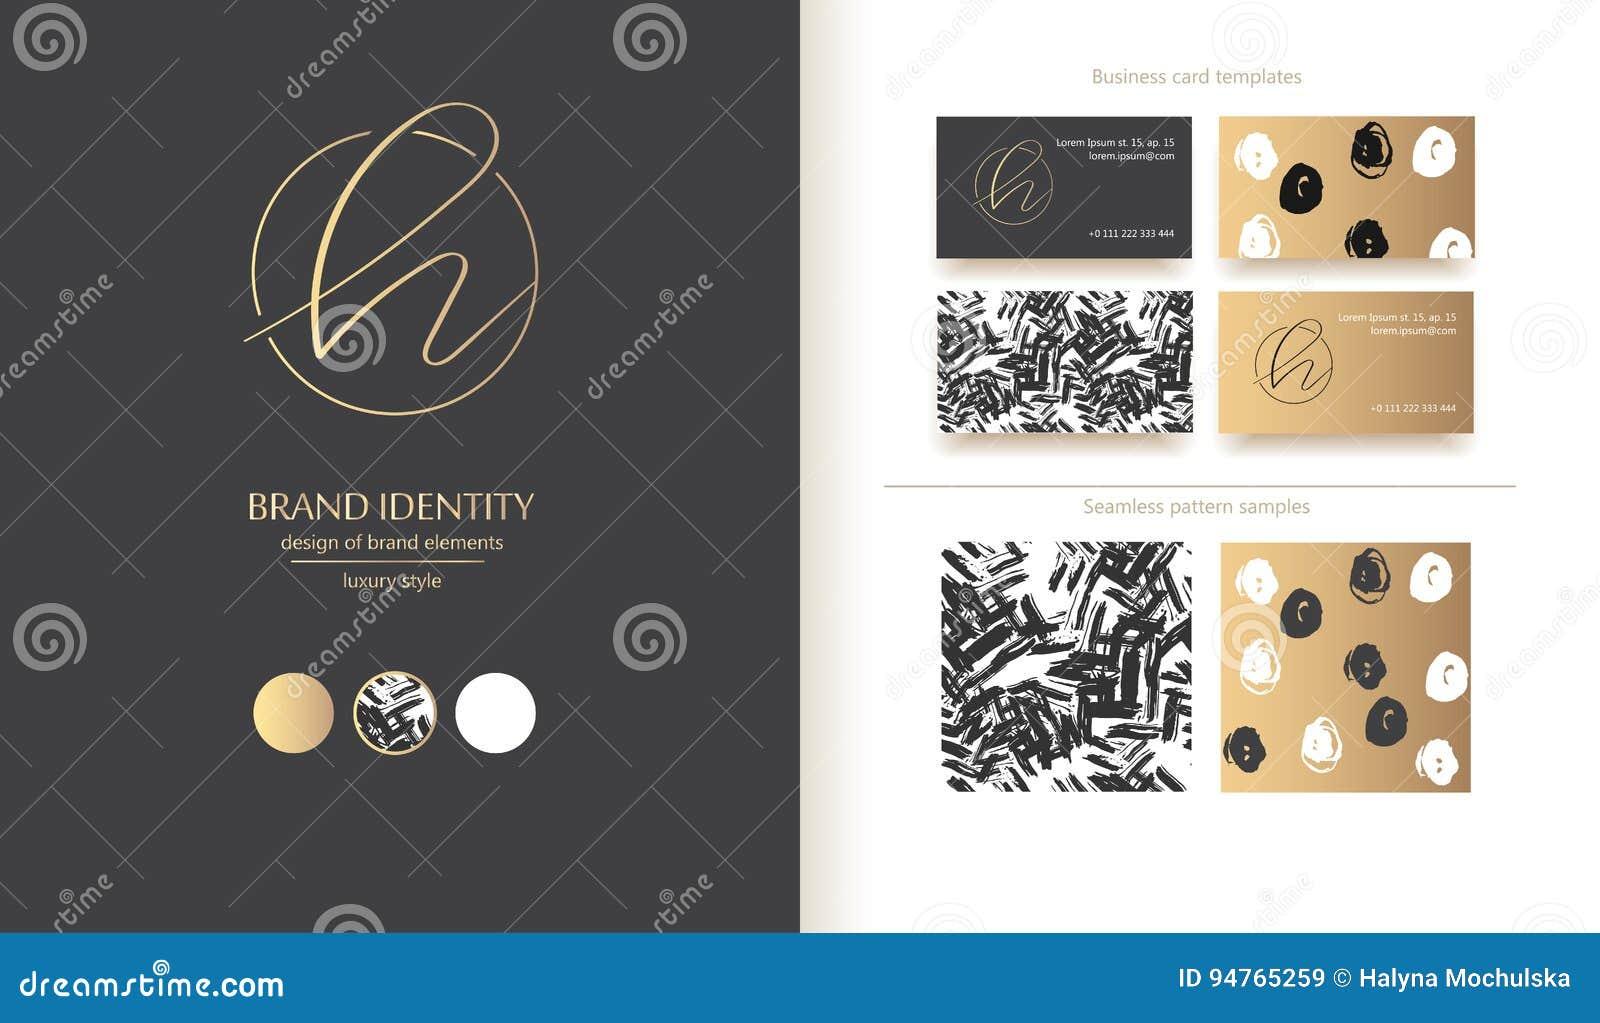 400 Creative Business Card Design Inspiration  Logo